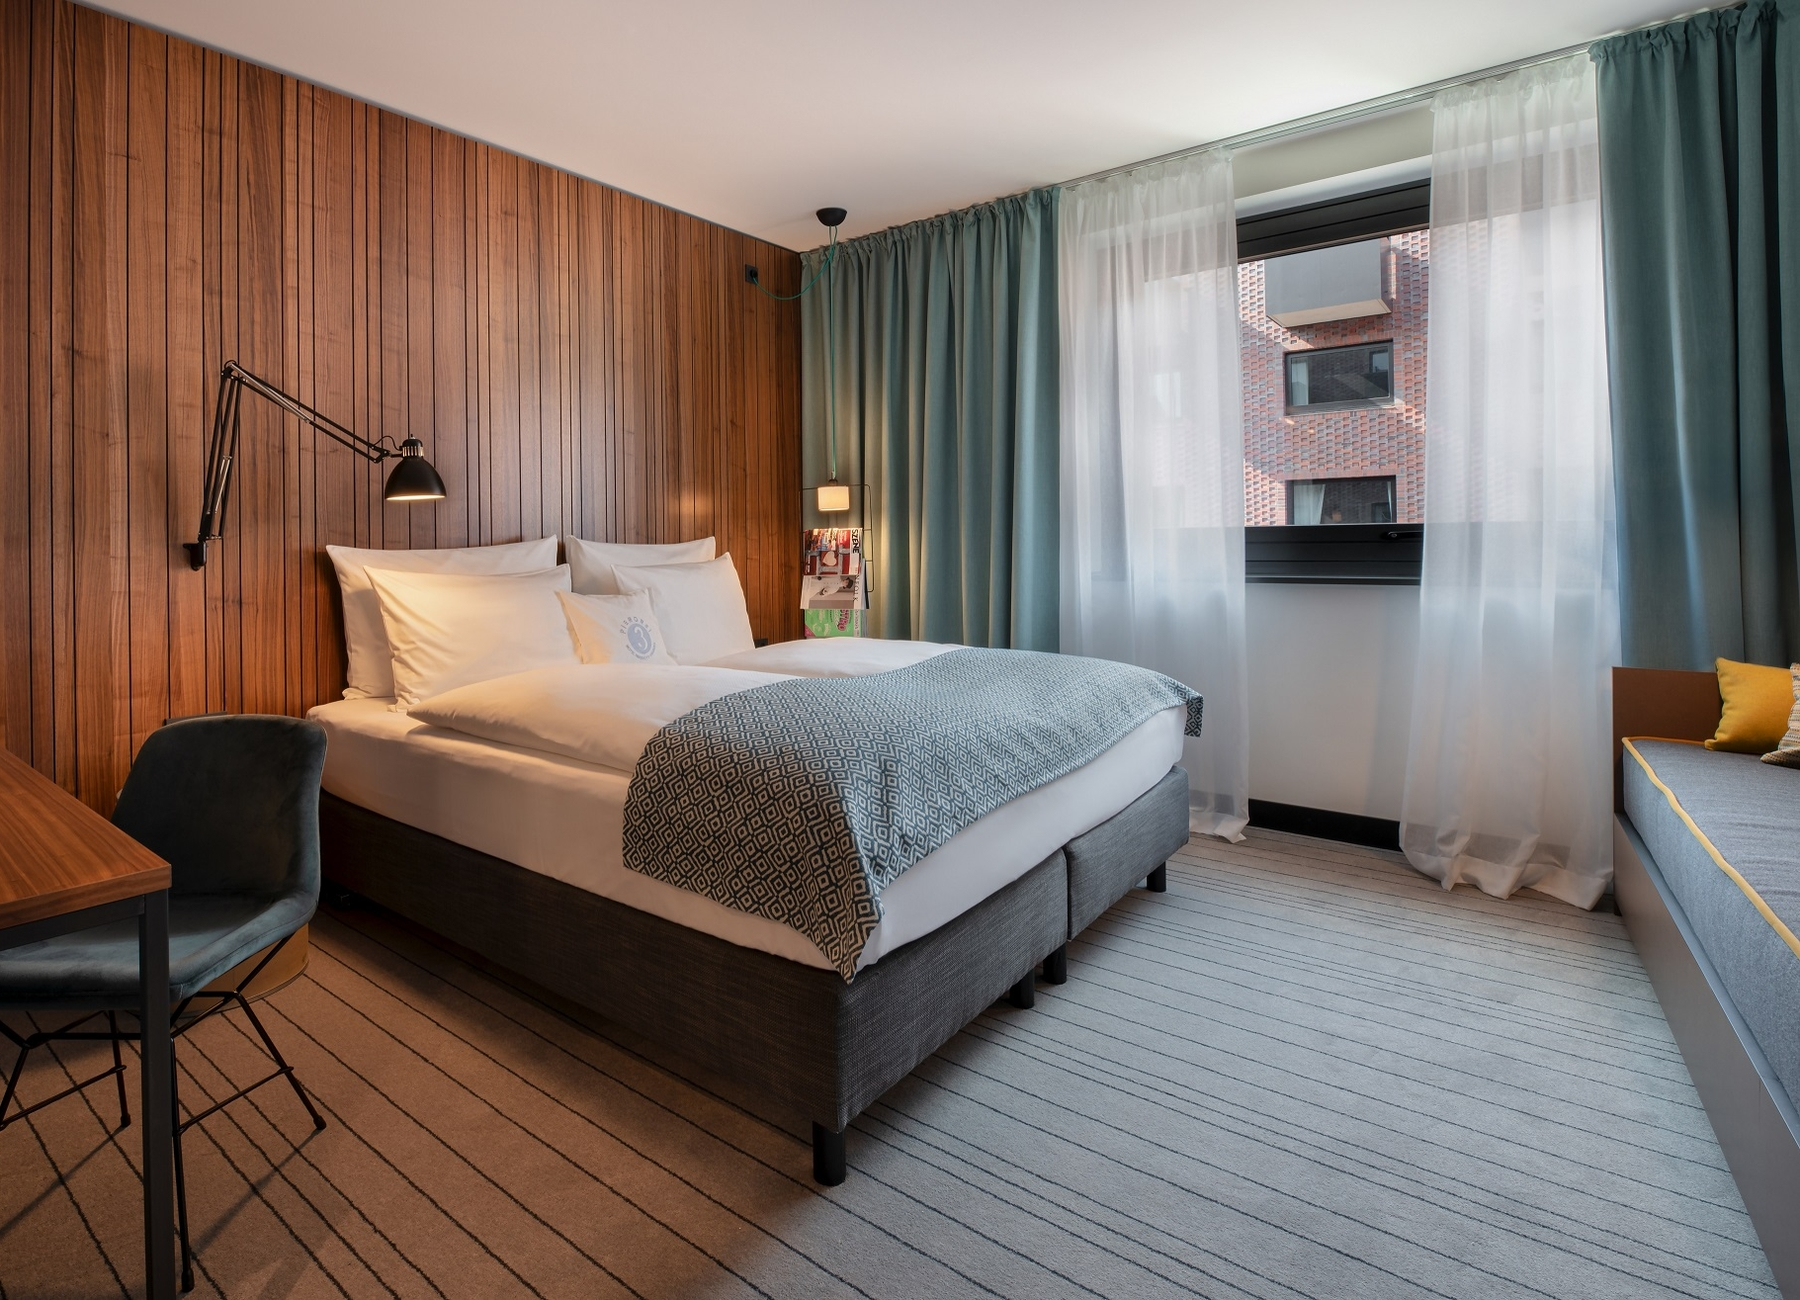 Highline 1100 SPECIAL MADE-Pierdrei Hotel-Germany